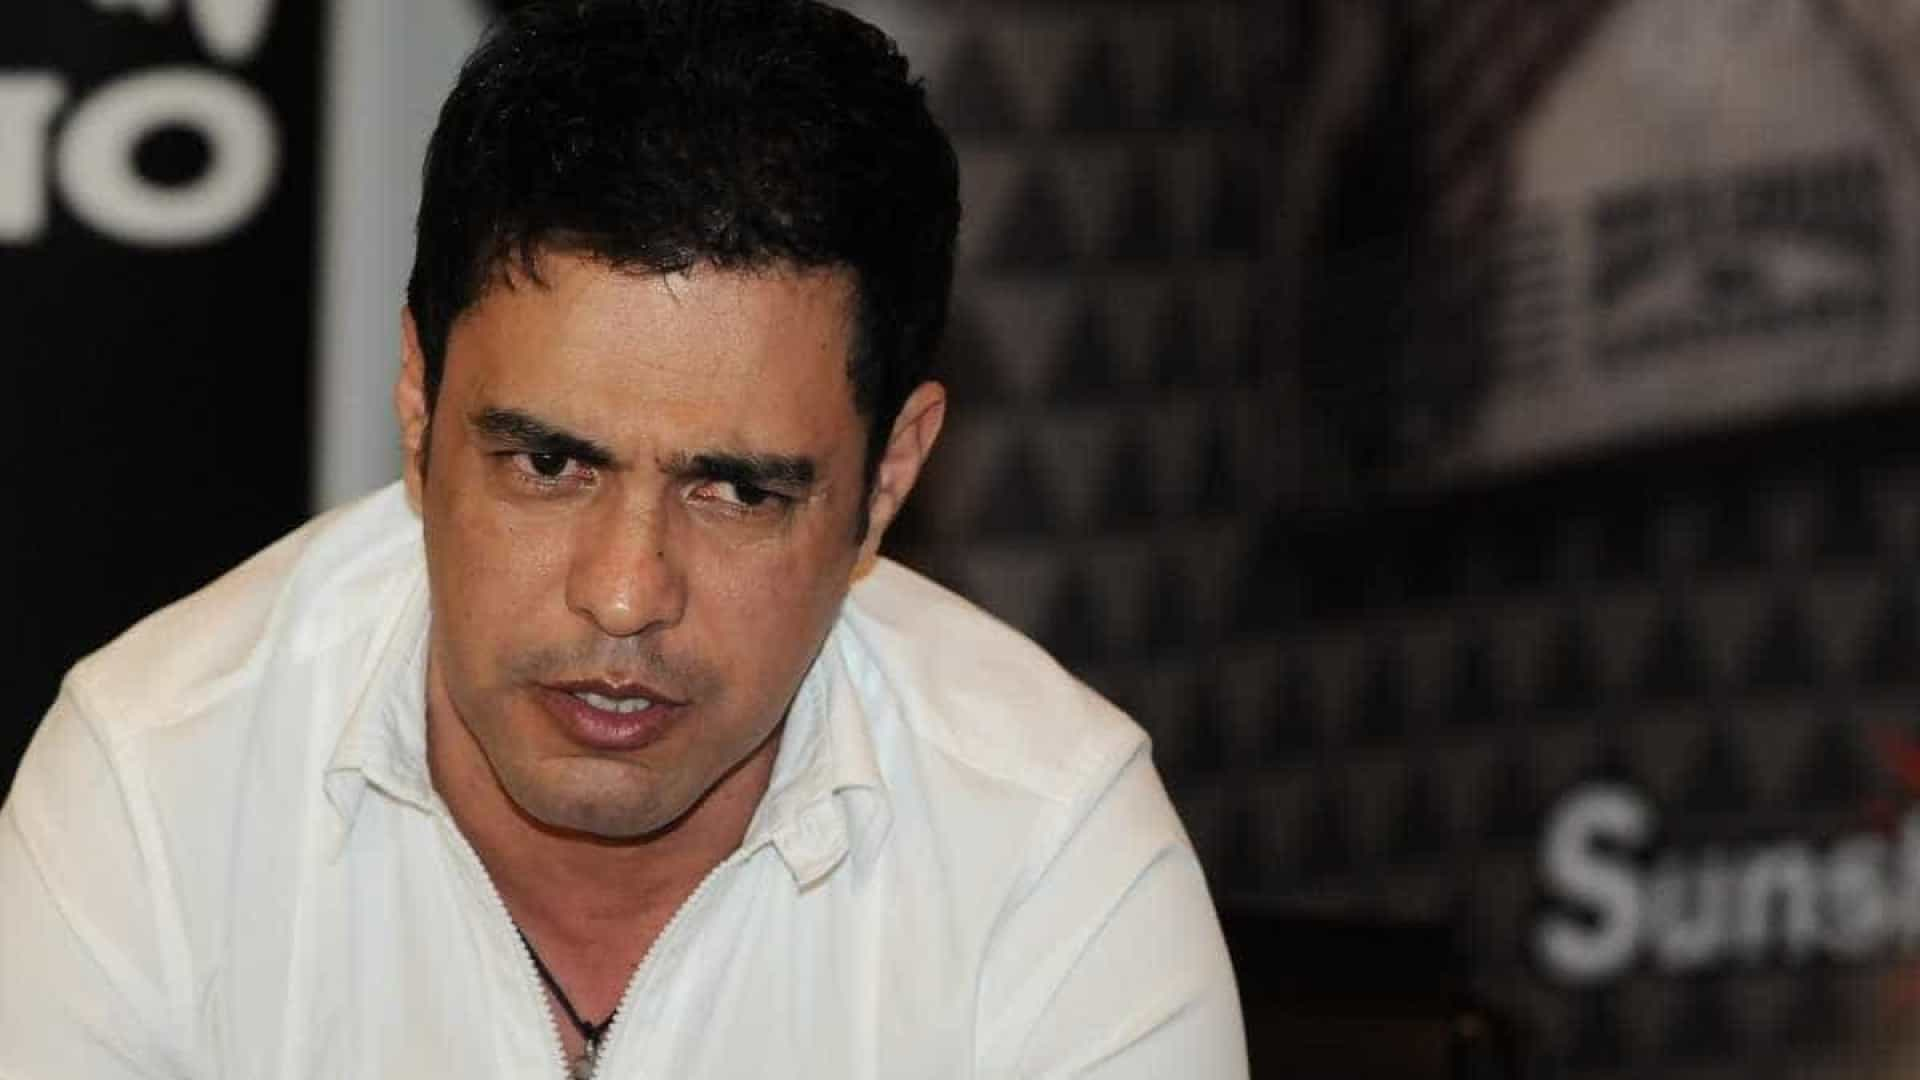 Justiça condena Zezé a pagar indenização para ex-motorista